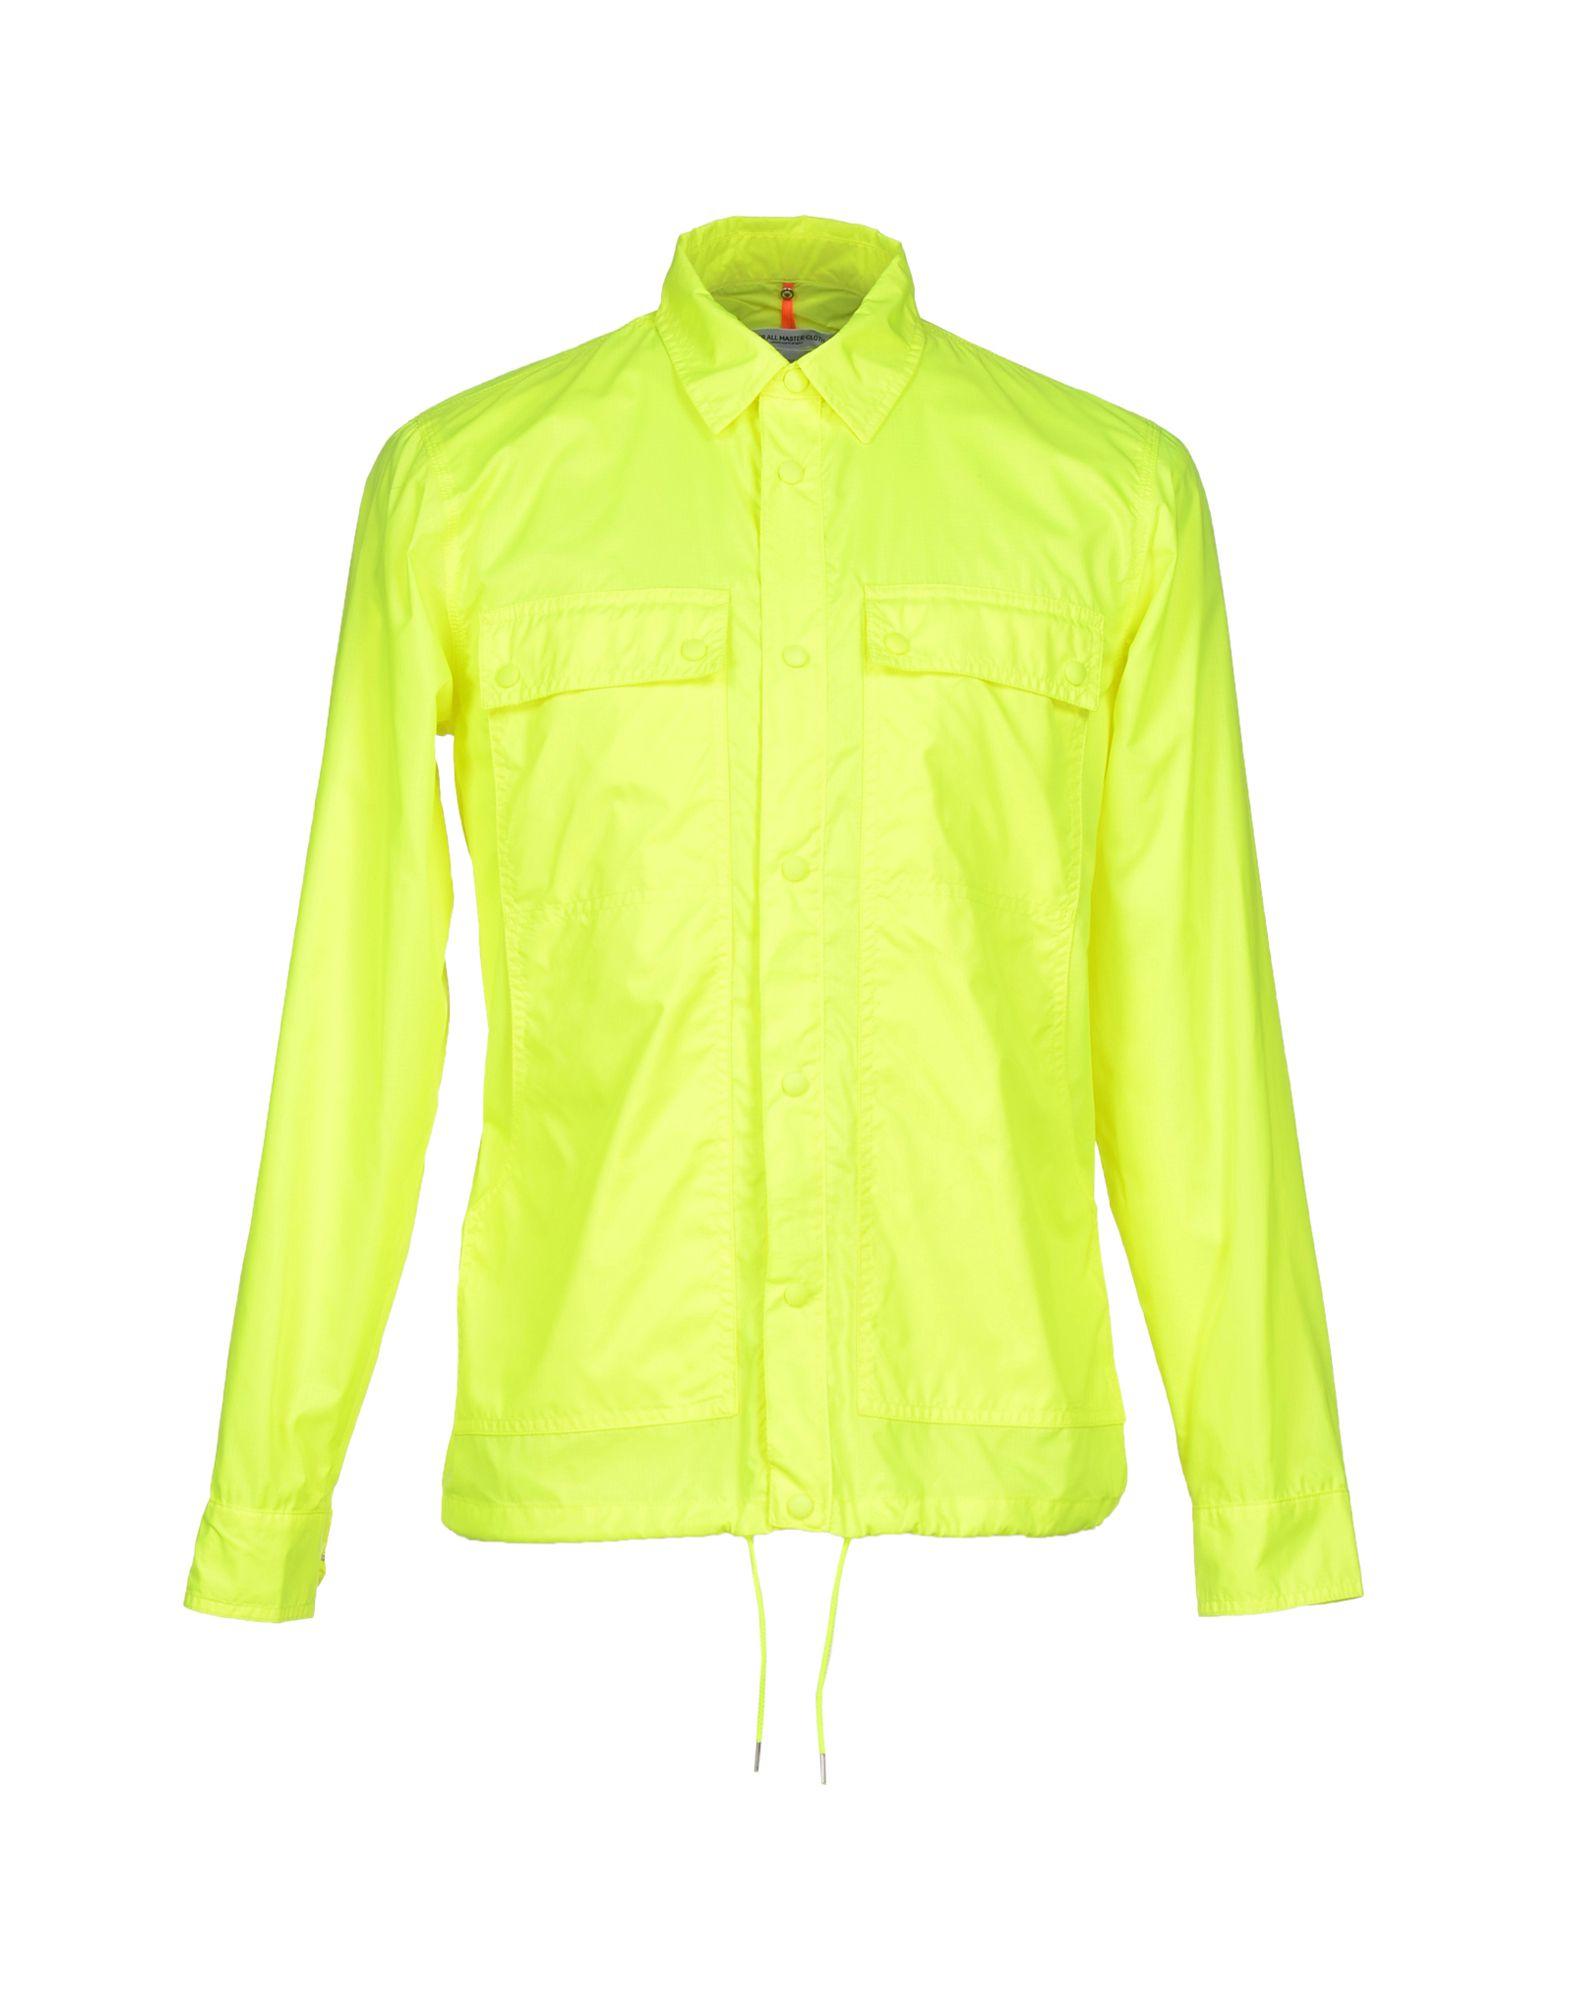 yellow jacket buddhist single men Cedarville university yellow jackets athletics skip navigation links baseball men's basketball men's cross standard for most three-pointers in a single.